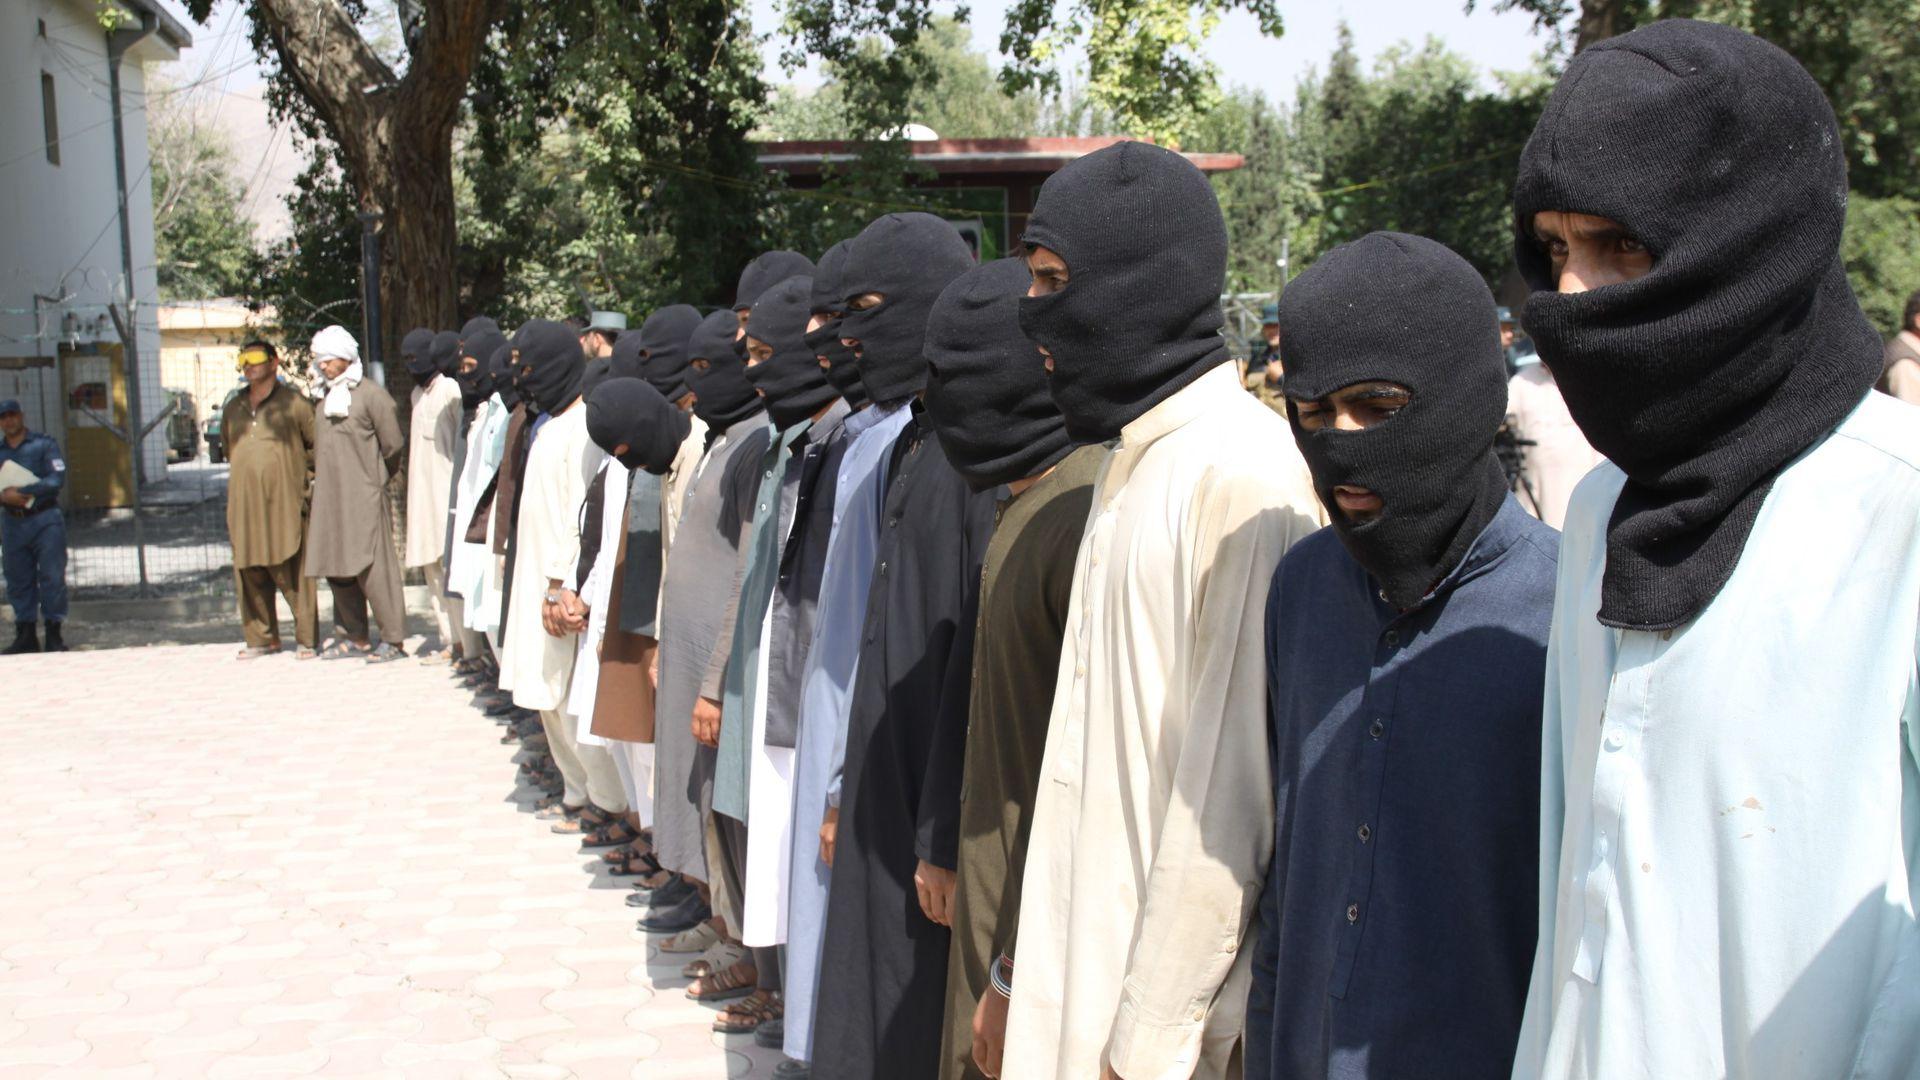 Daesh in Afganistan